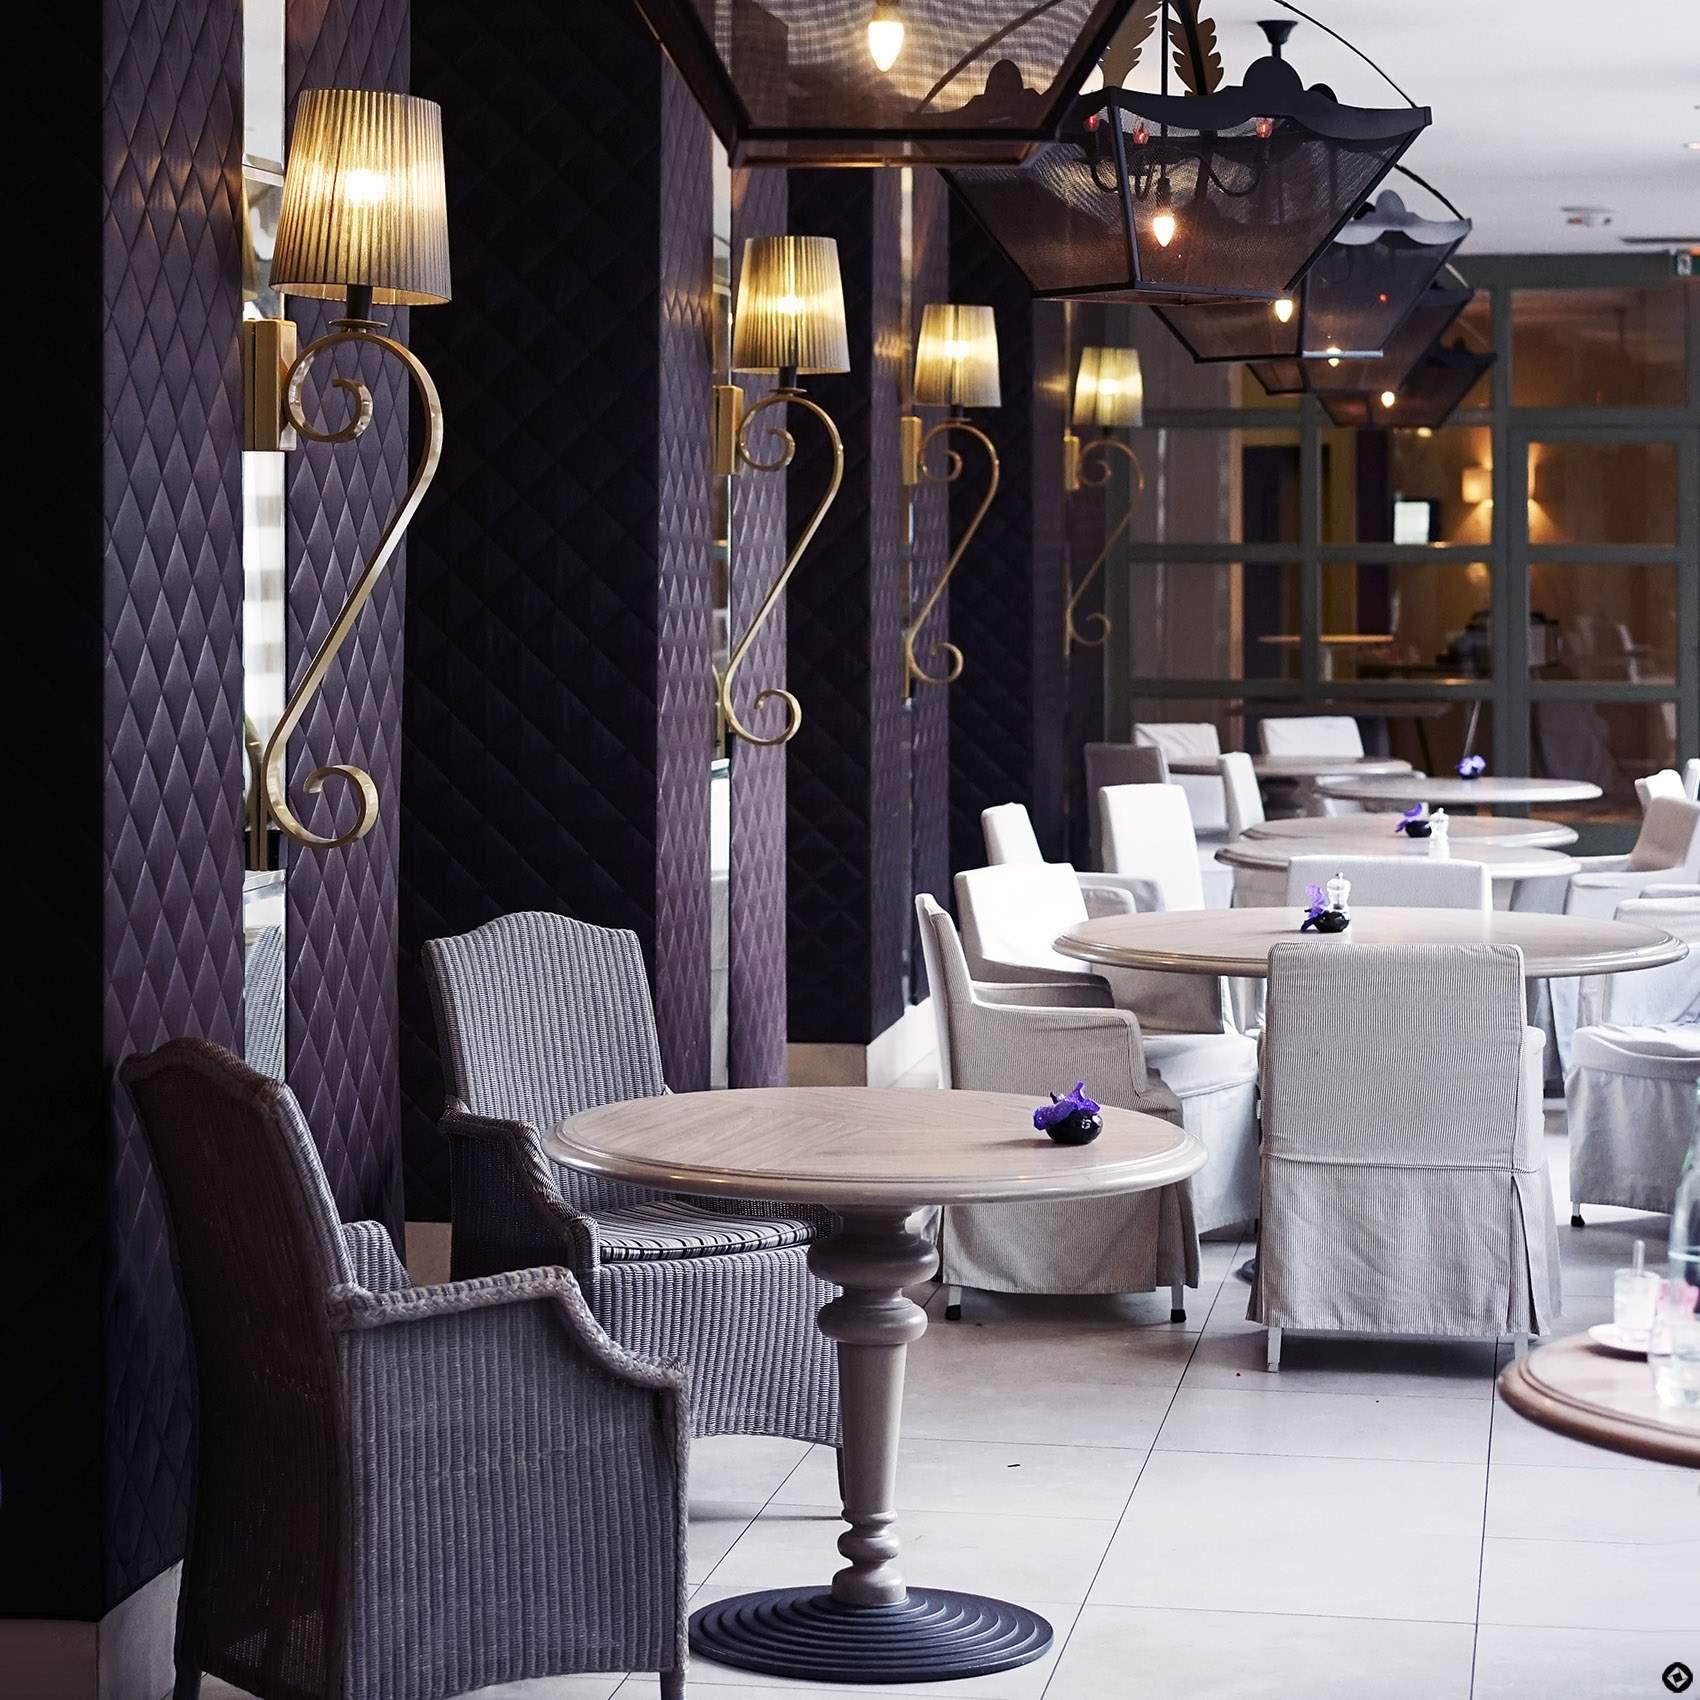 grand-hotel-roi-rene-blog-deco-design_7